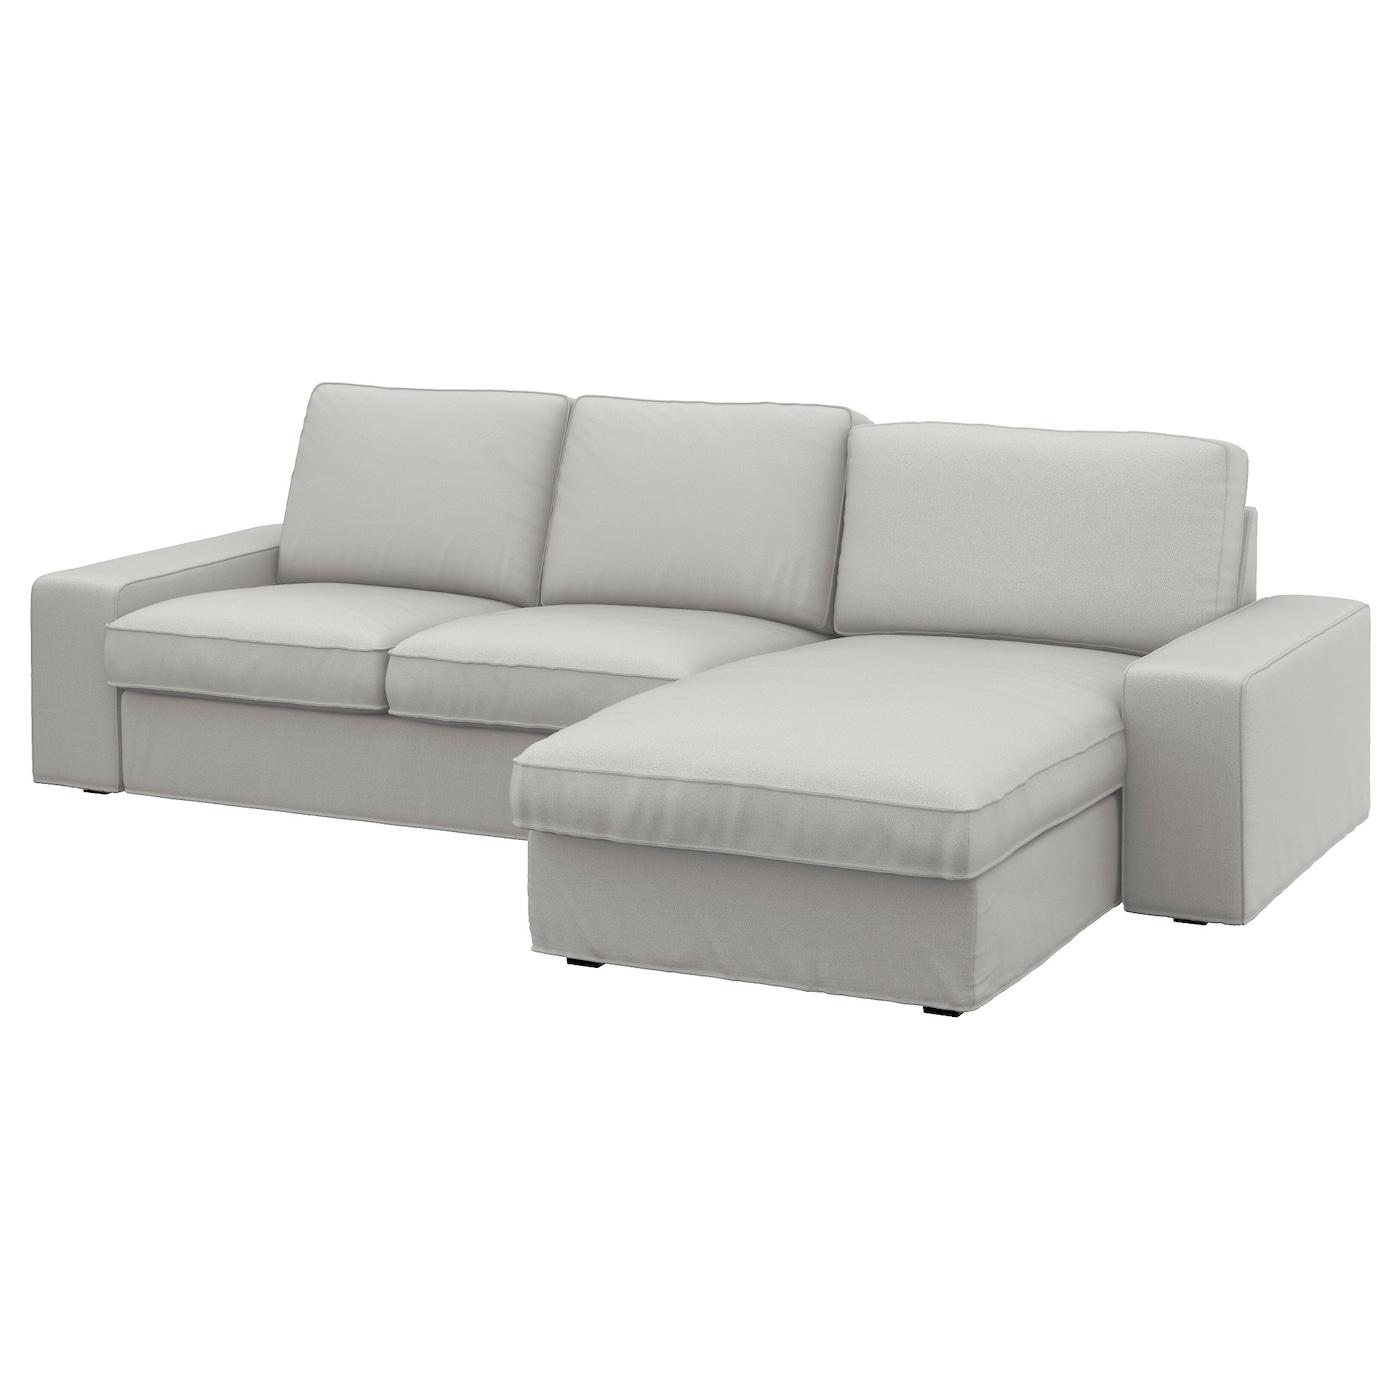 Kivik 3 Seat Sofa With Chaise Longue Ramna Light Grey Ikea Ireland